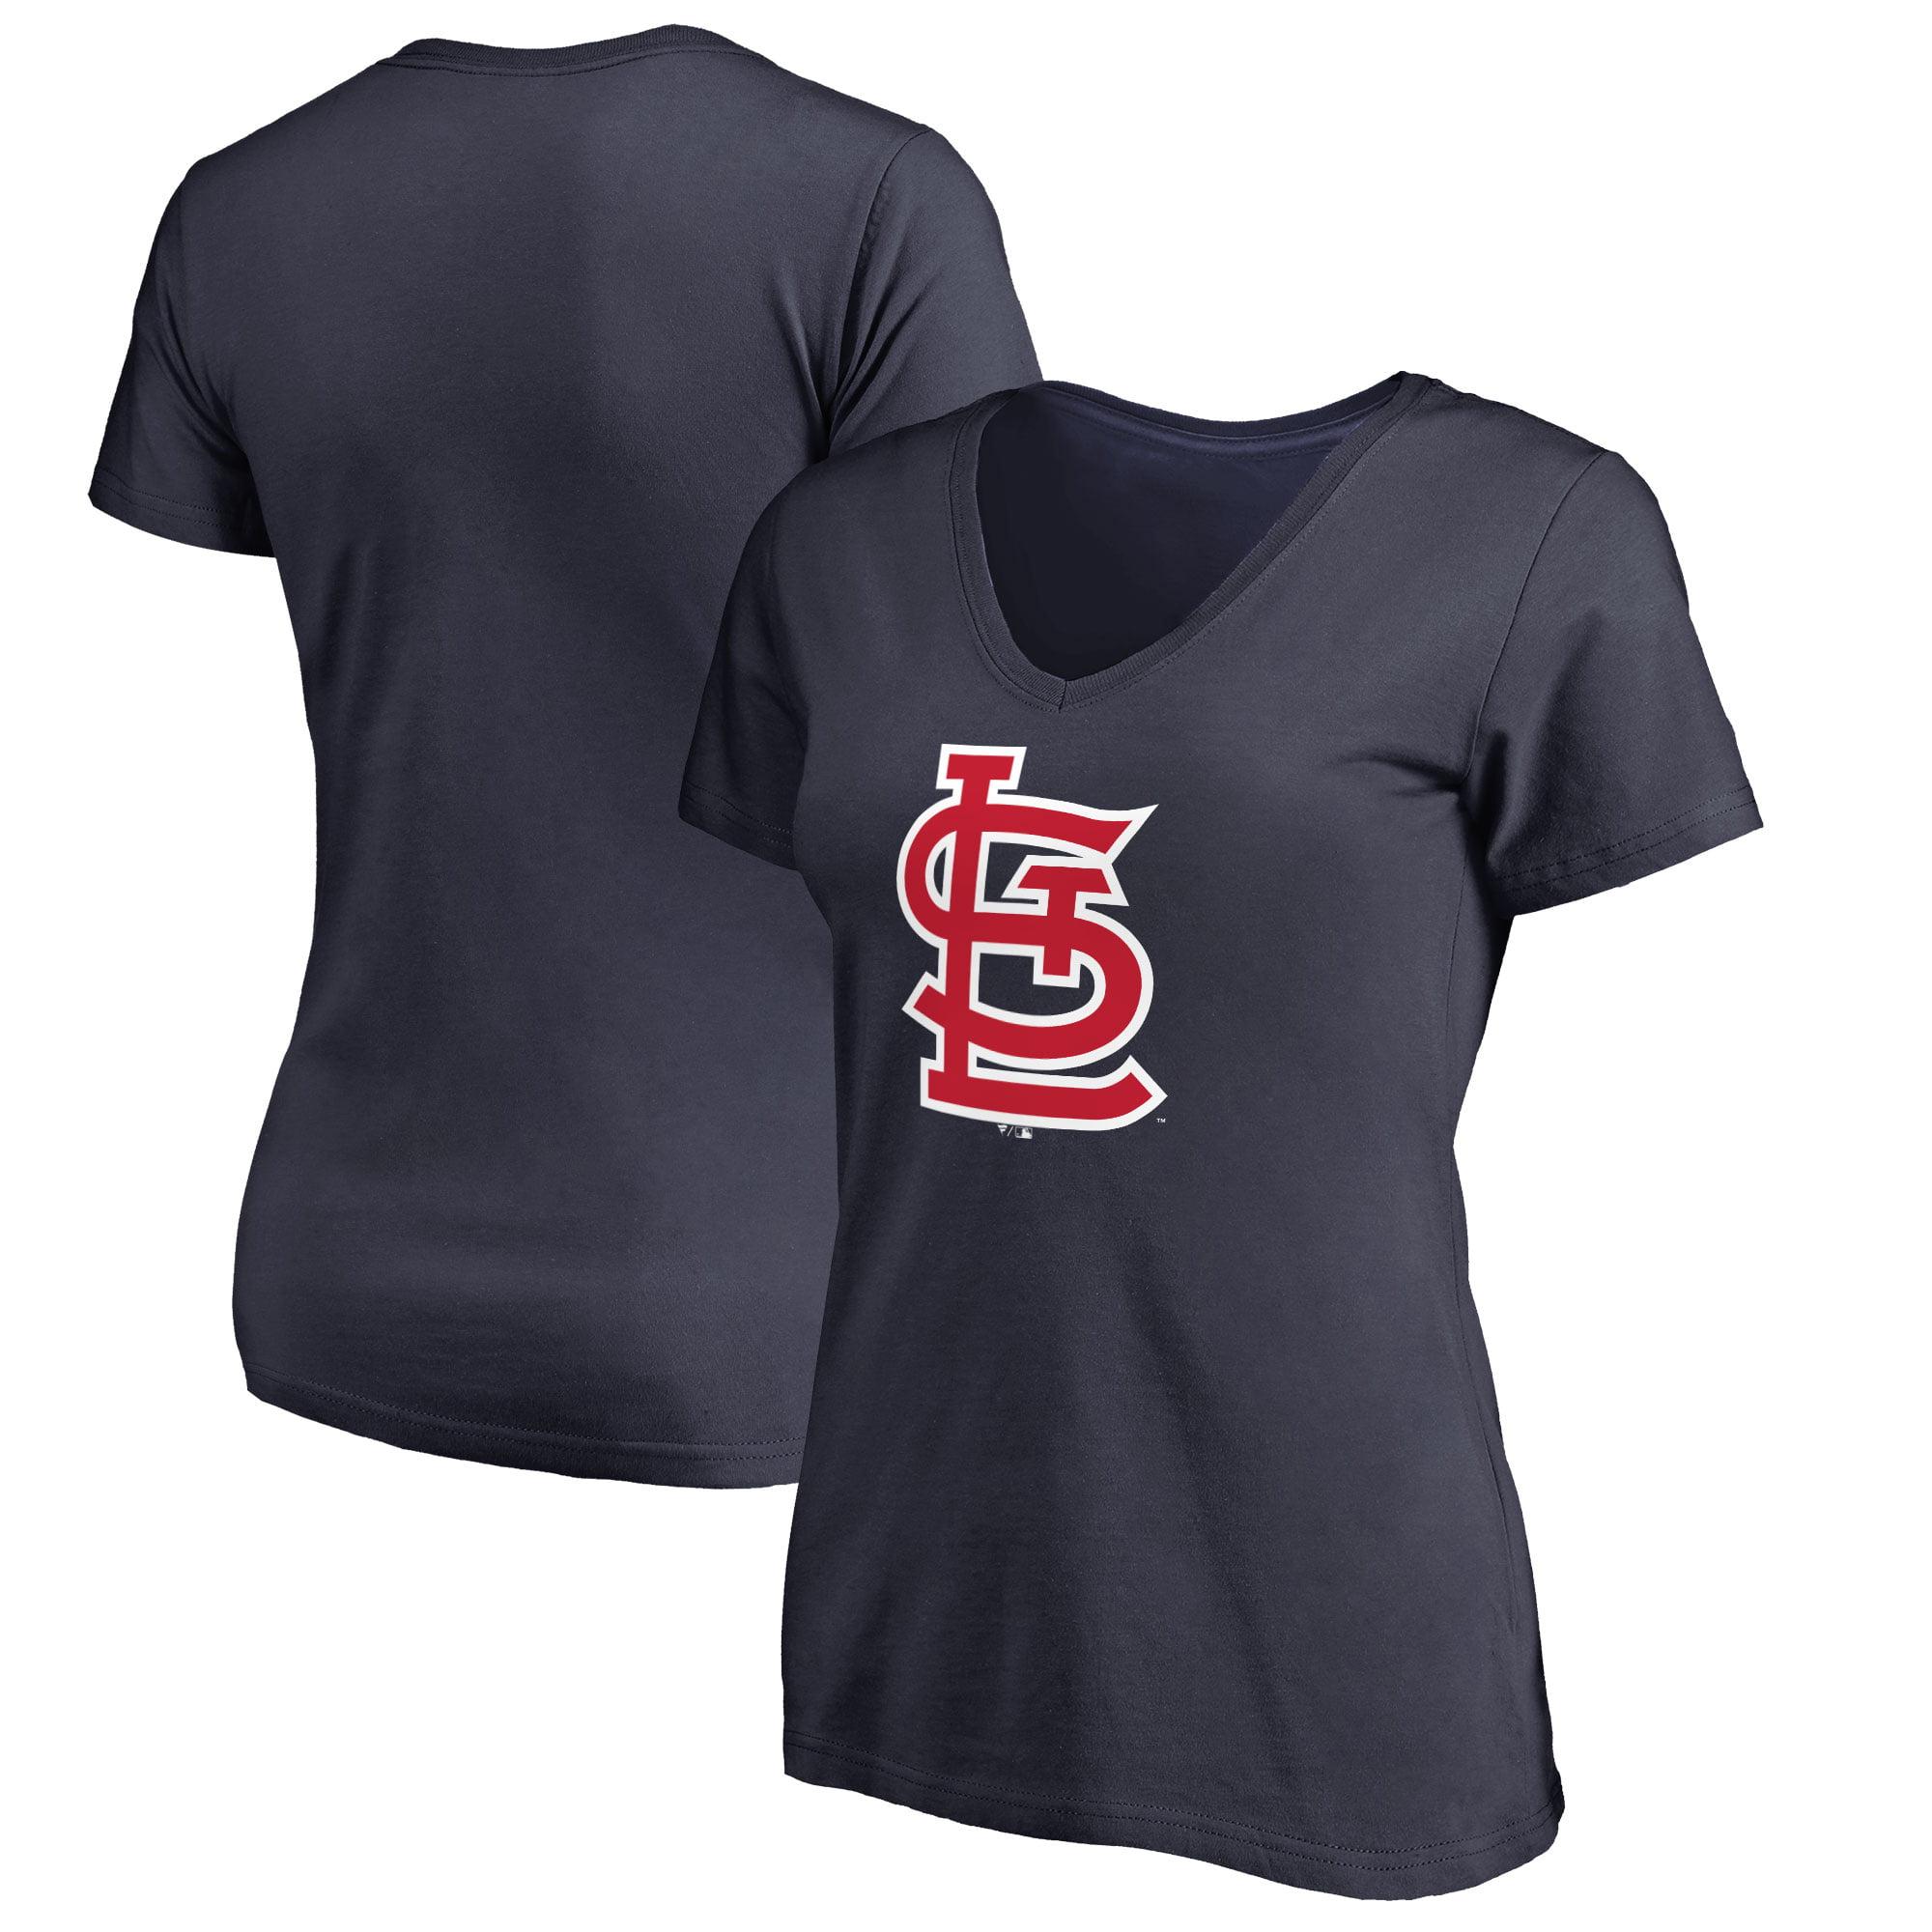 St. Louis Cardinals Women's Plus Sizes Primary Team Logo T-Shirt - Navy